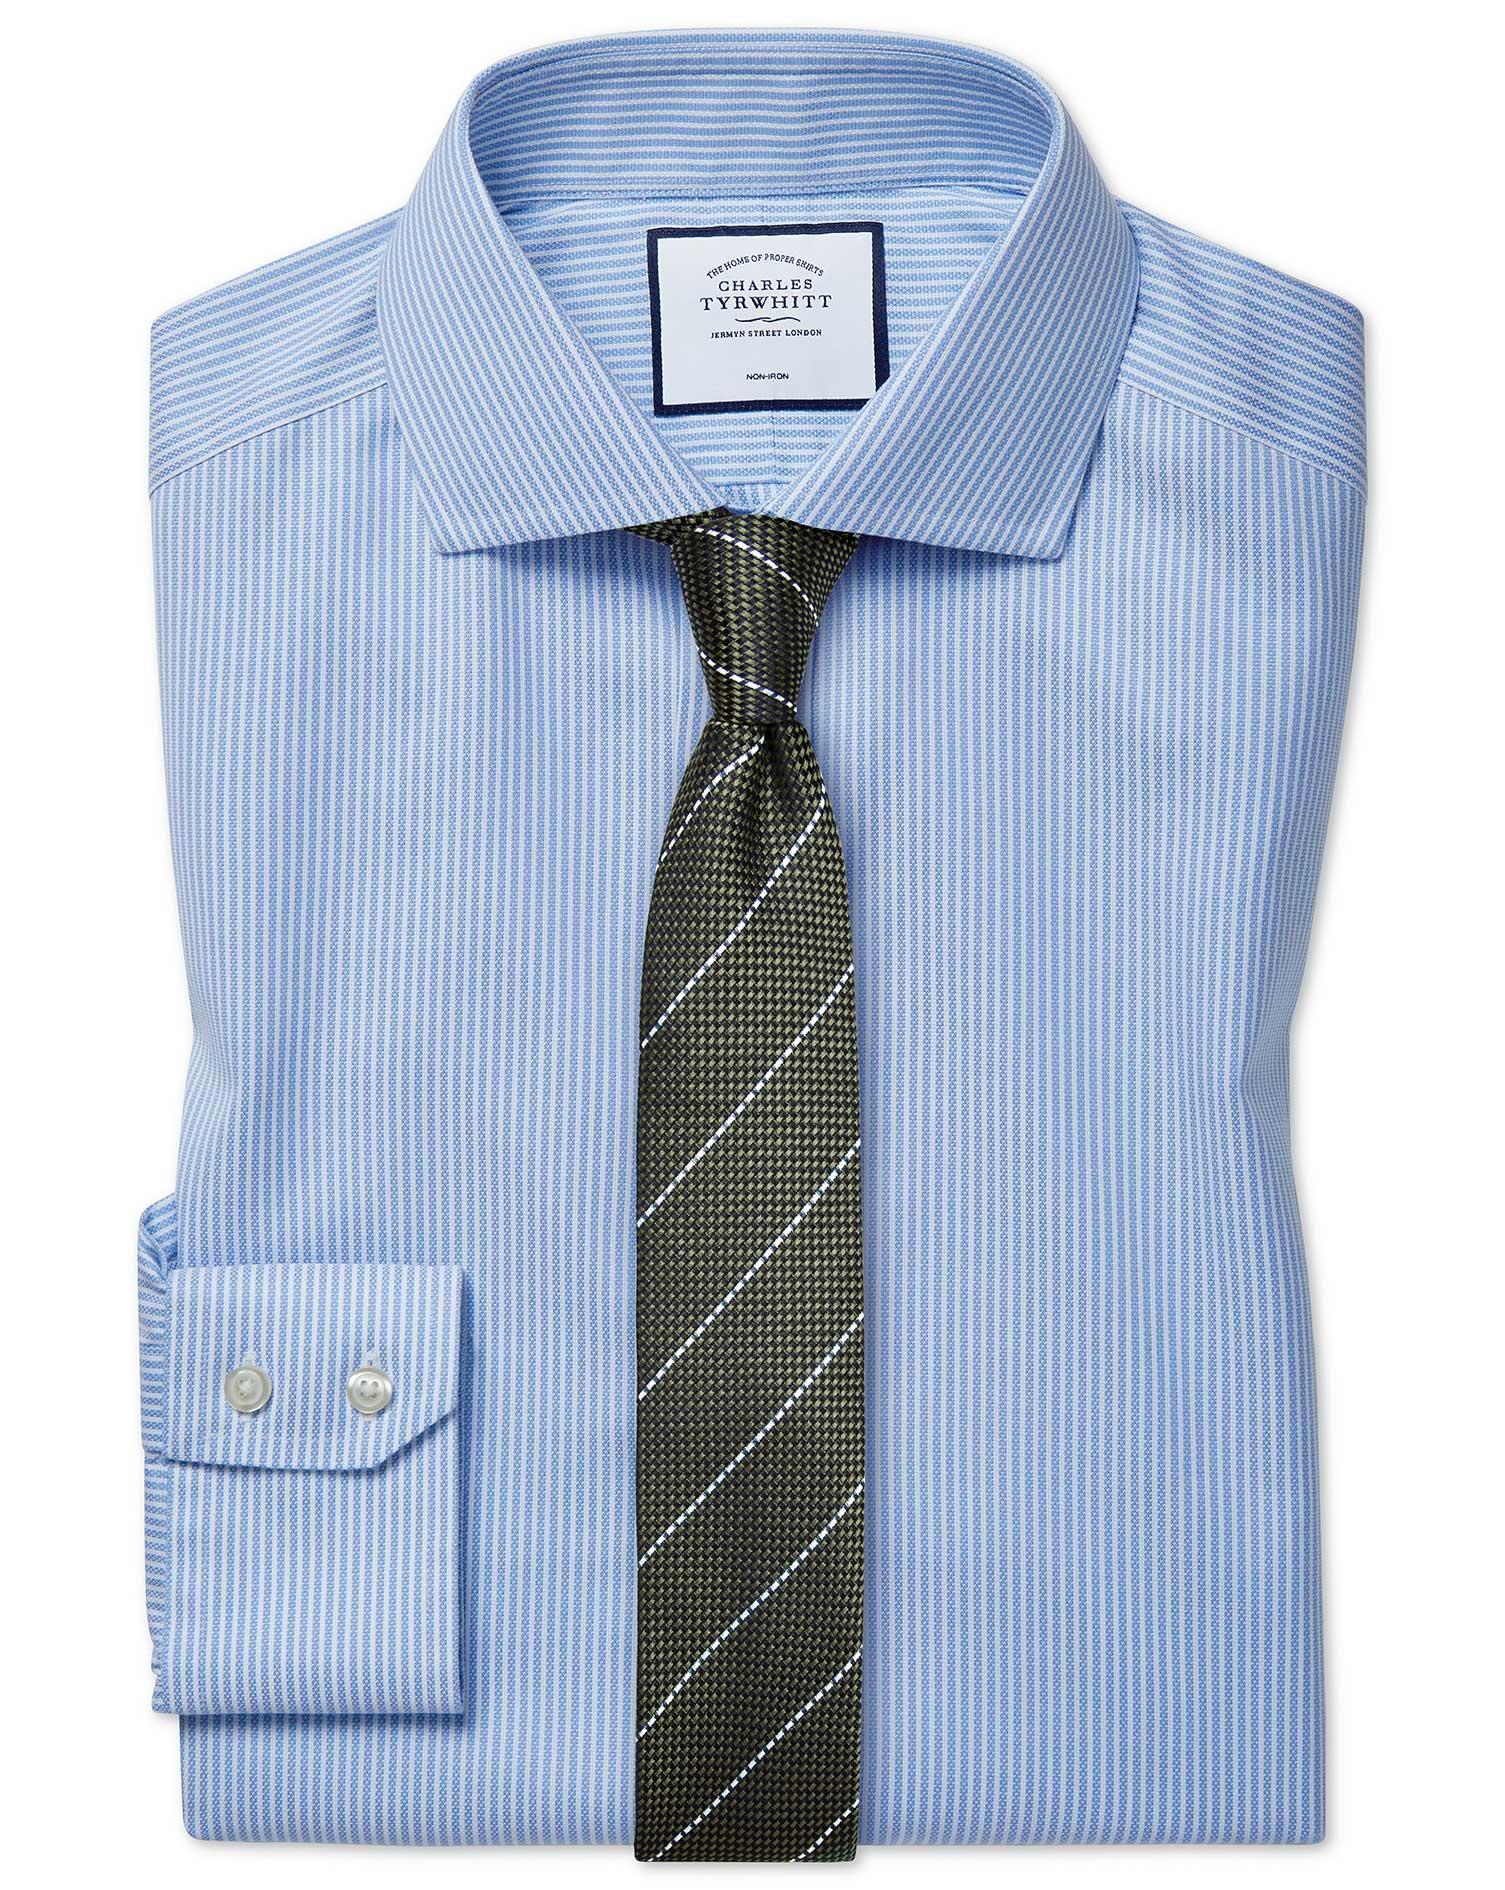 Slim Fit Cutaway Non-Iron Cotton Stretch Oxford Sky Blue Stripe Shirt